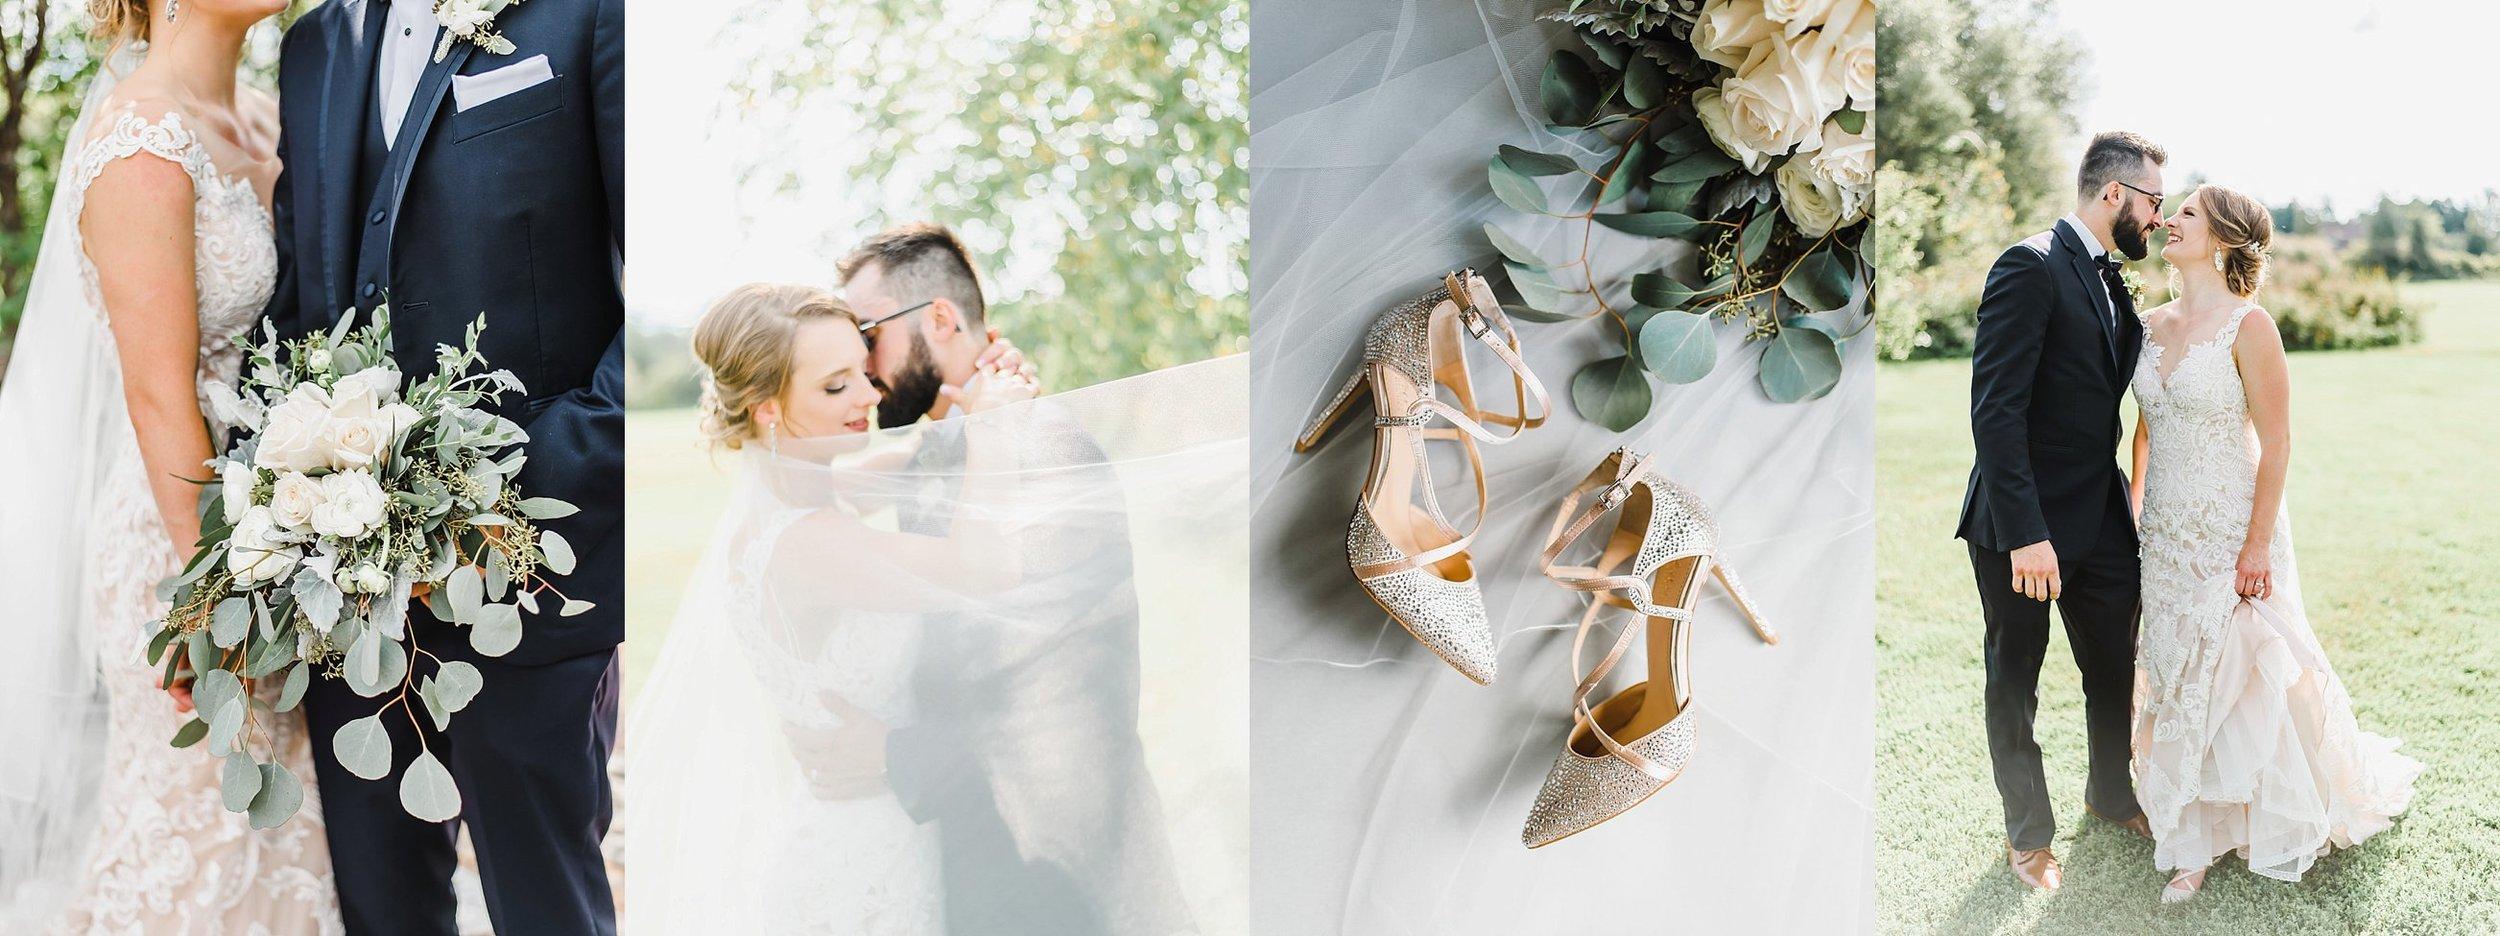 light airy indie fine art ottawa wedding photographer | Ali and Batoul Photography_1360.jpg